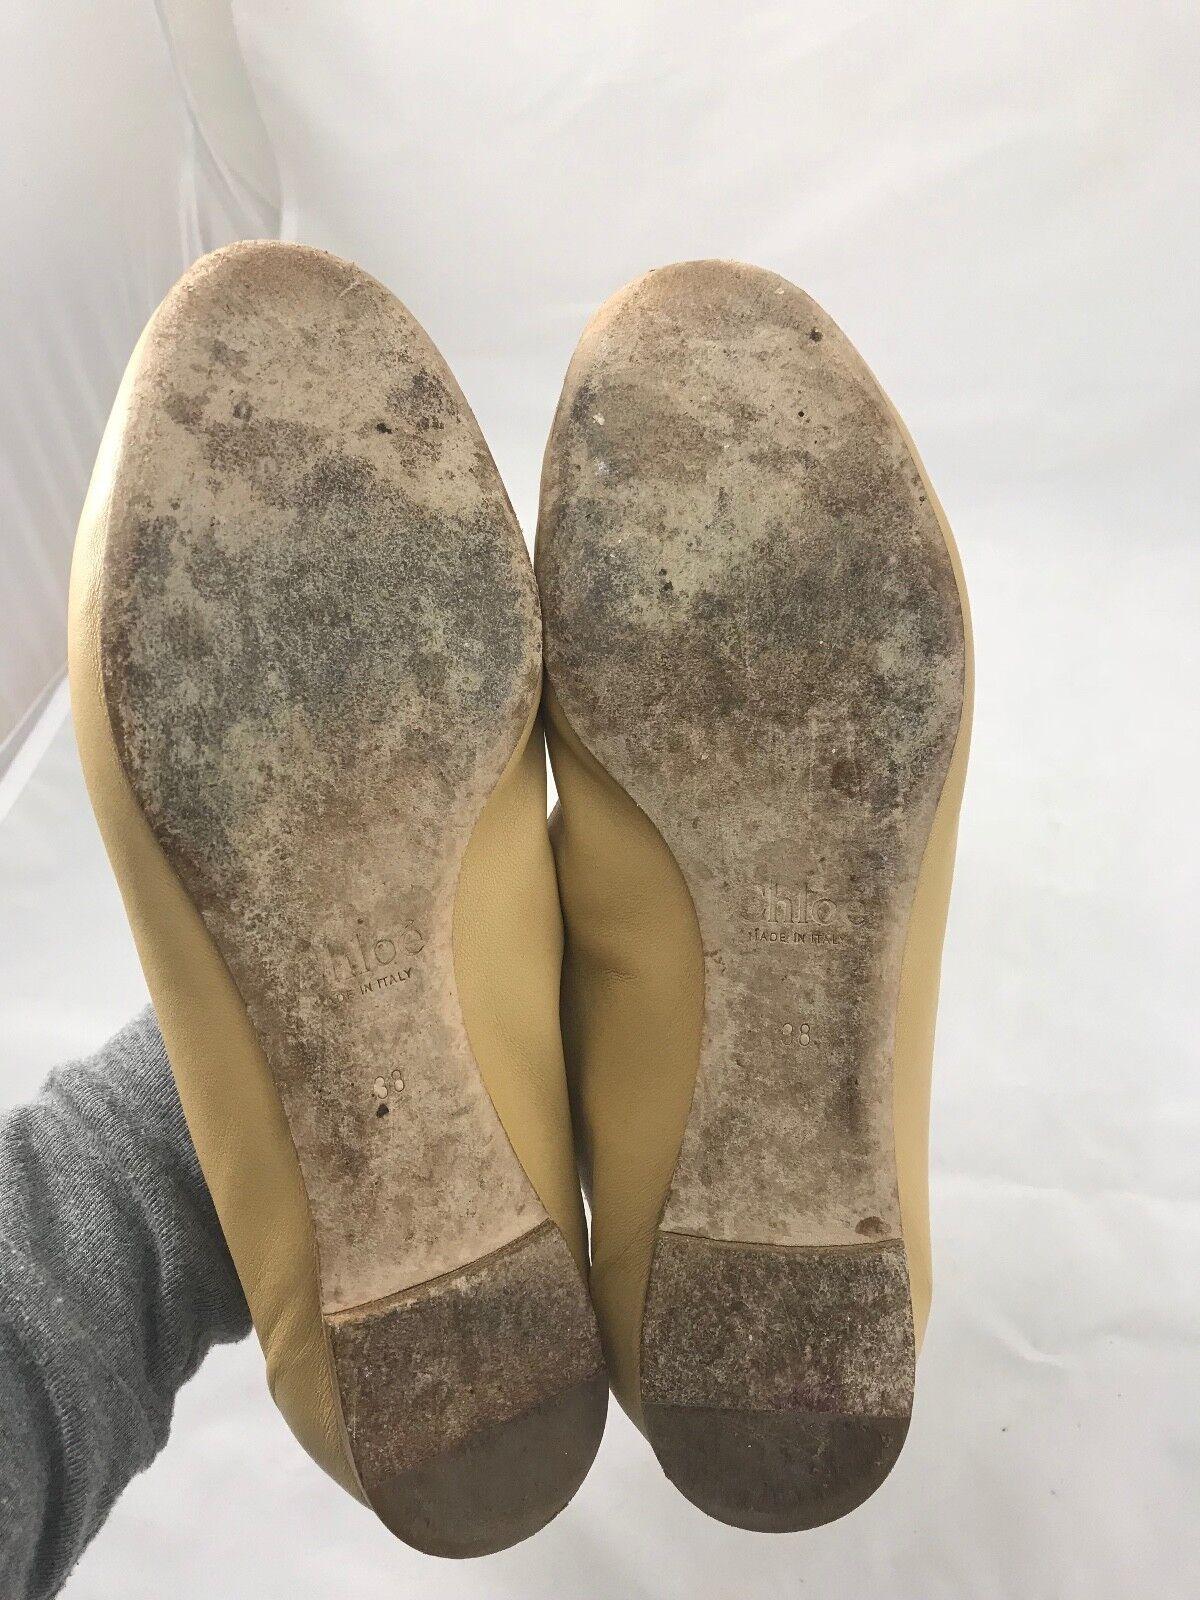 Chloe Leather Lauren Lauren Lauren Flats in Natural Size 38 8a9b4a